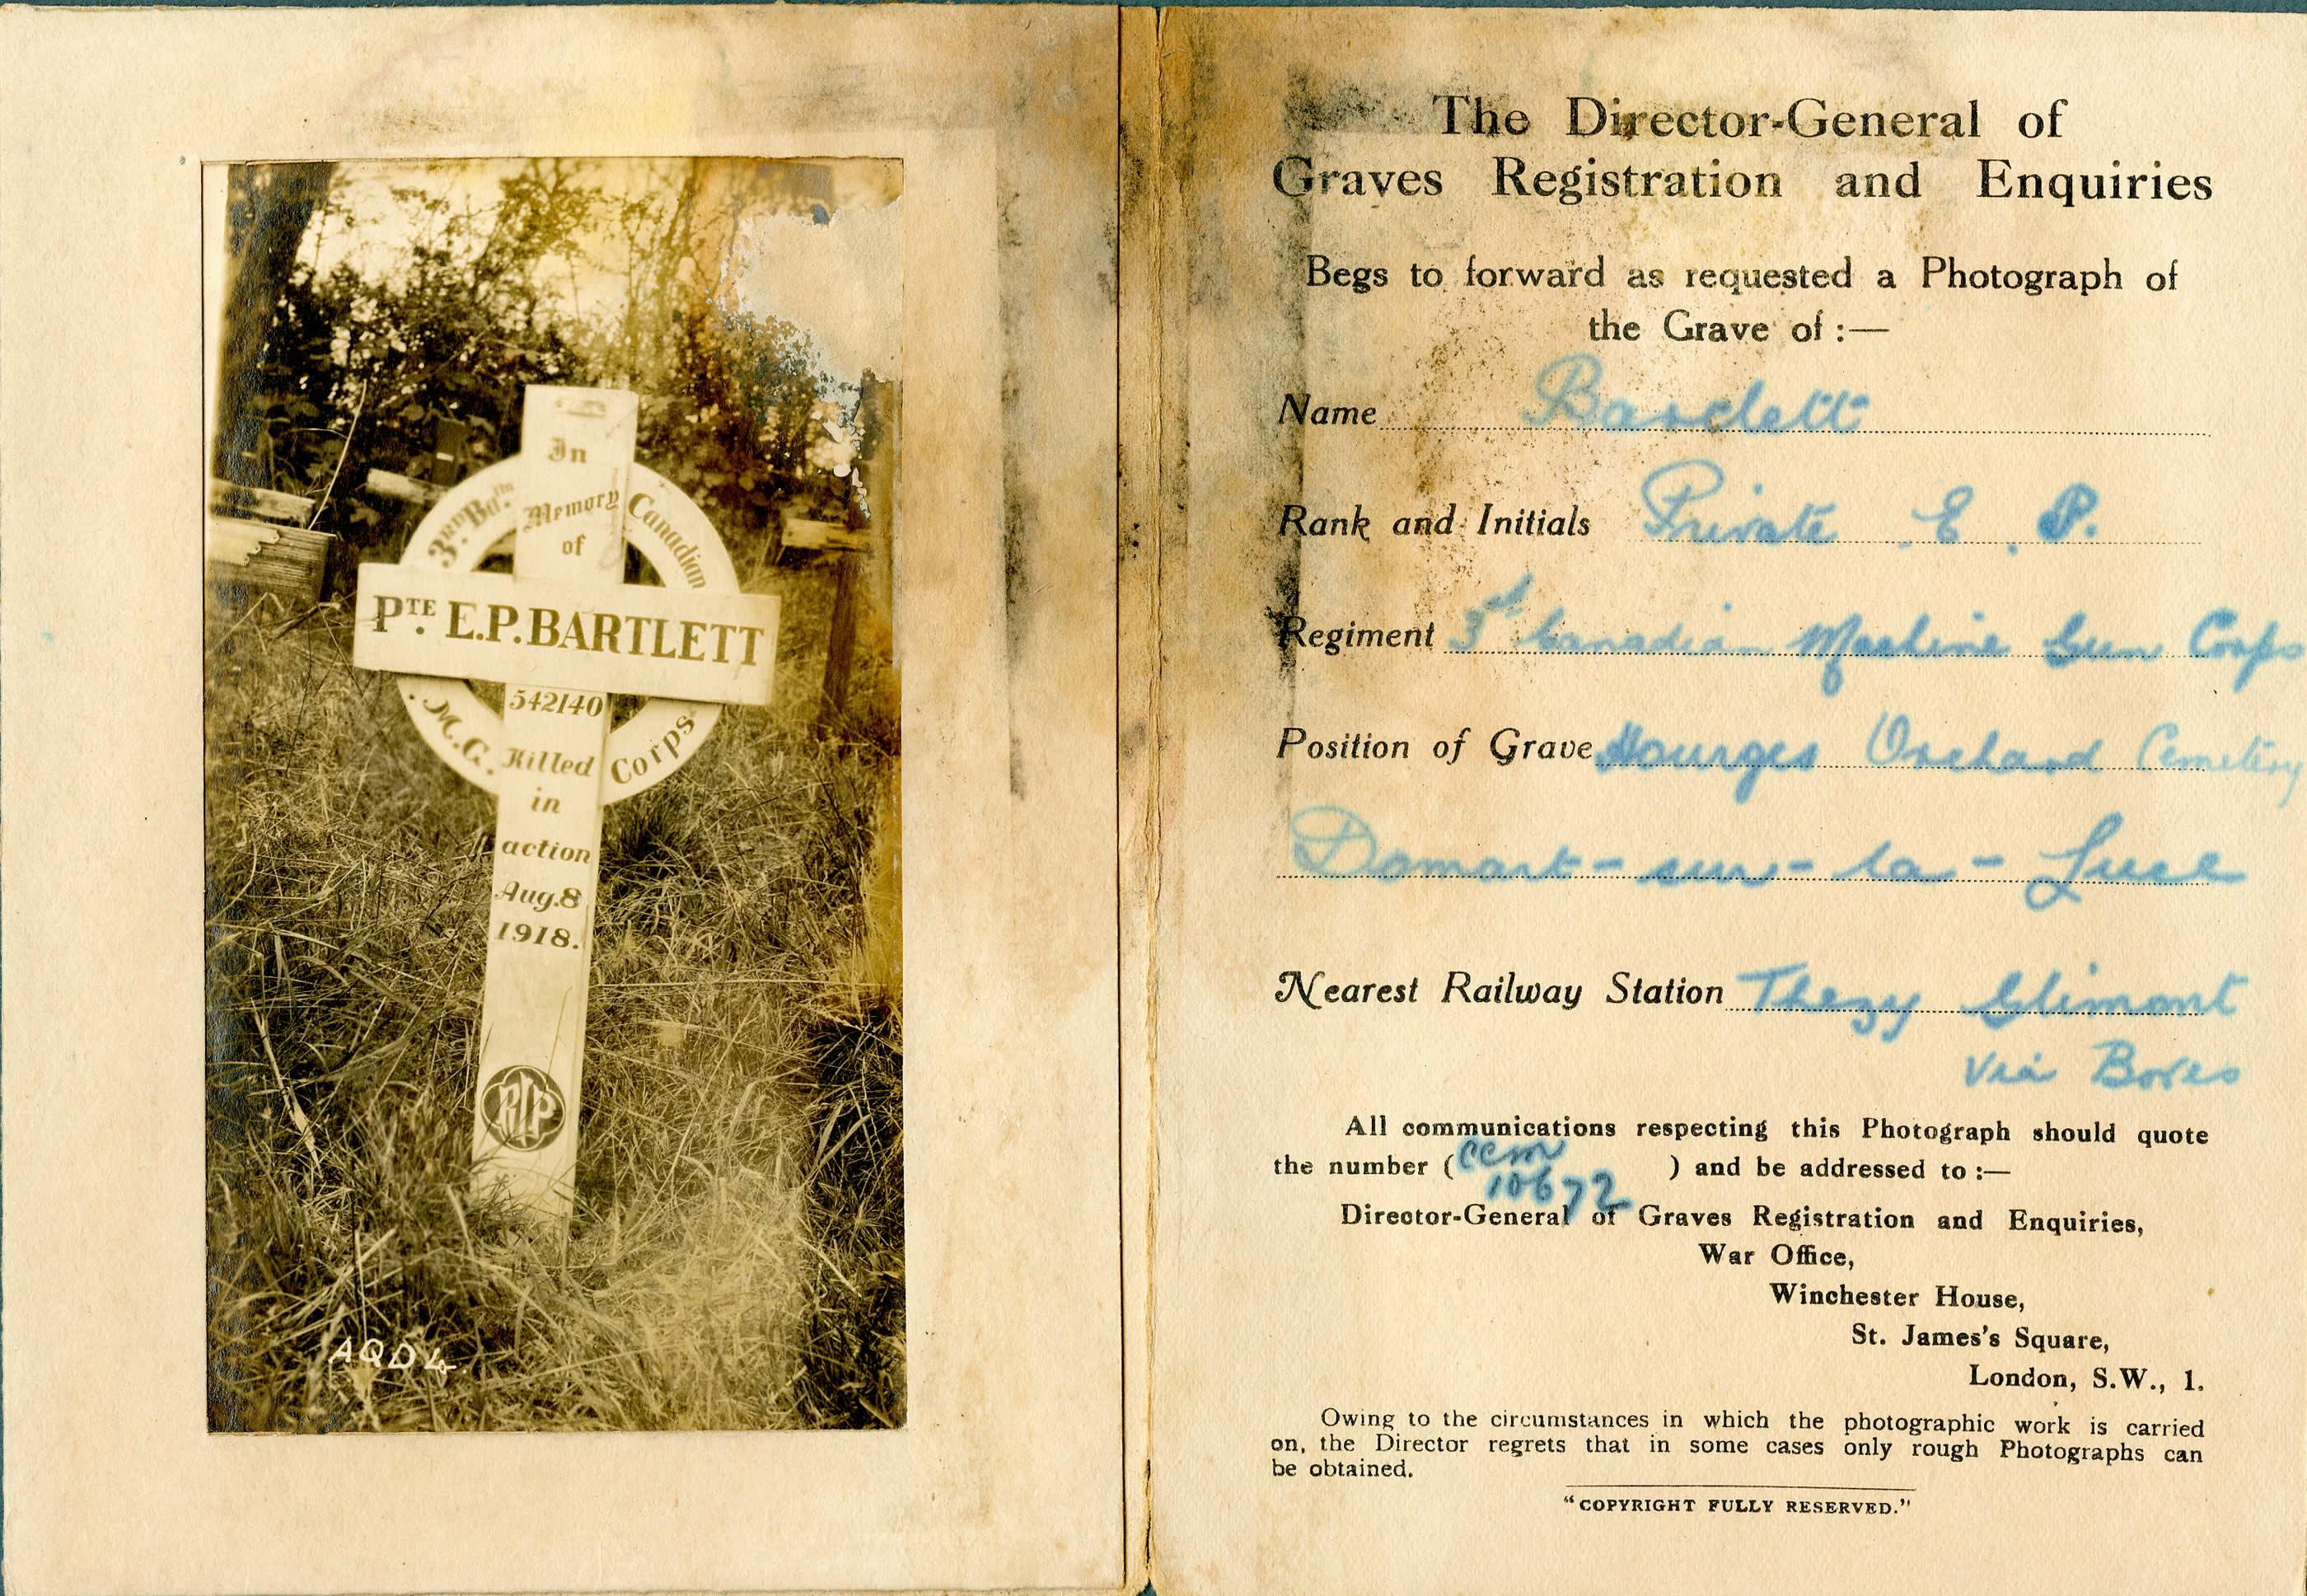 Temporary Grave Marker– Photograph of Pte Bartlett's wartime grave marker.